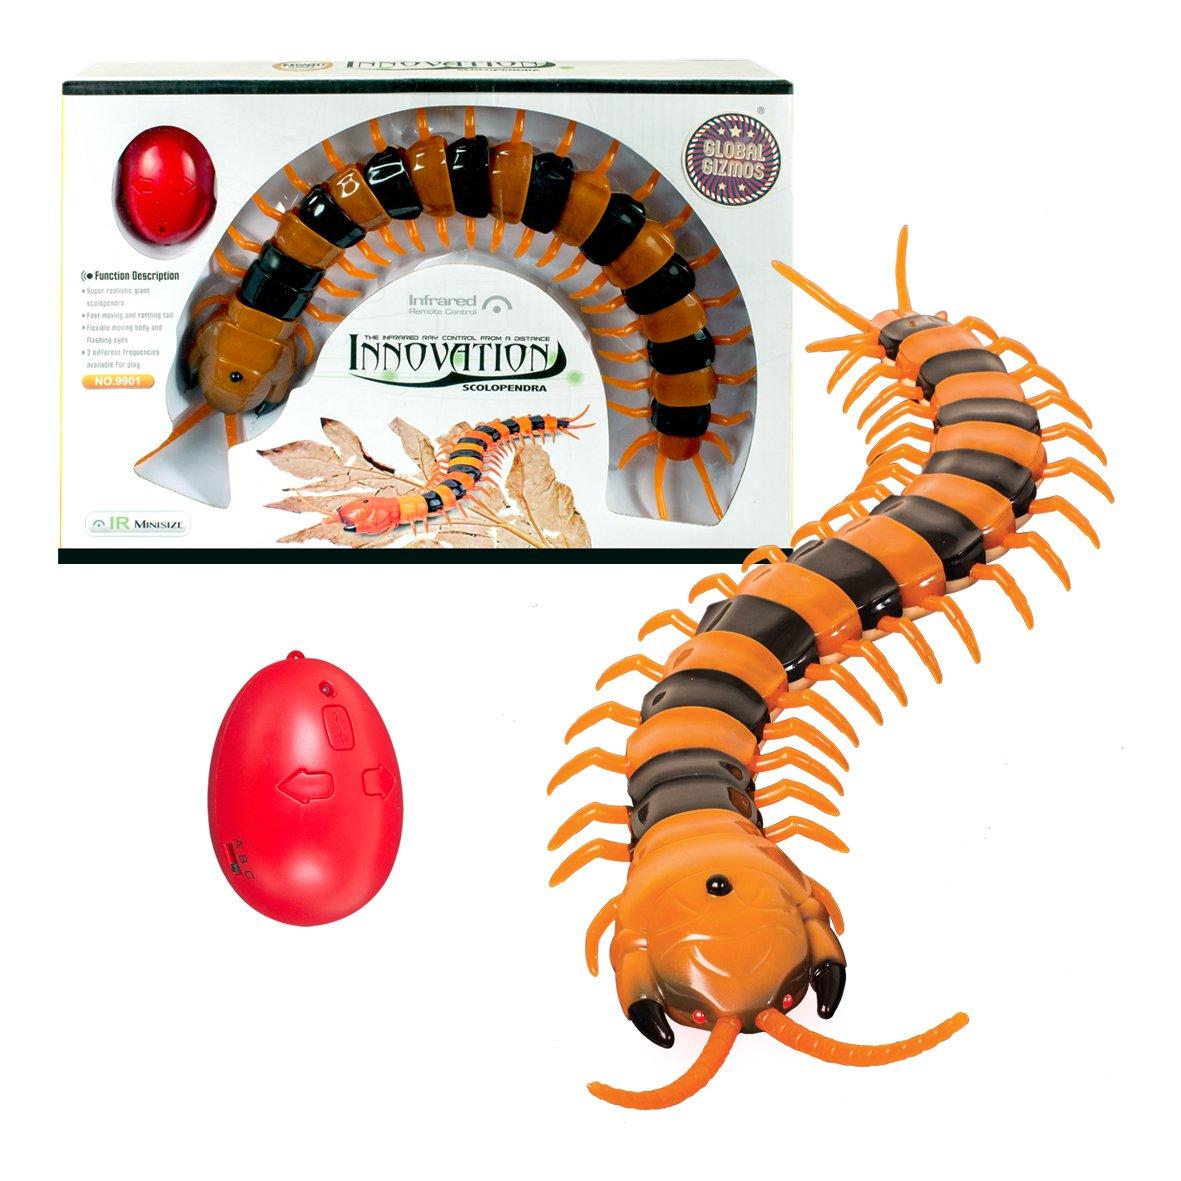 Global Gizmos 138.785, 6 cm batteriebetrieben Infrarot Fernbedienung Centipede Insekten Spielzeug Benross 54640